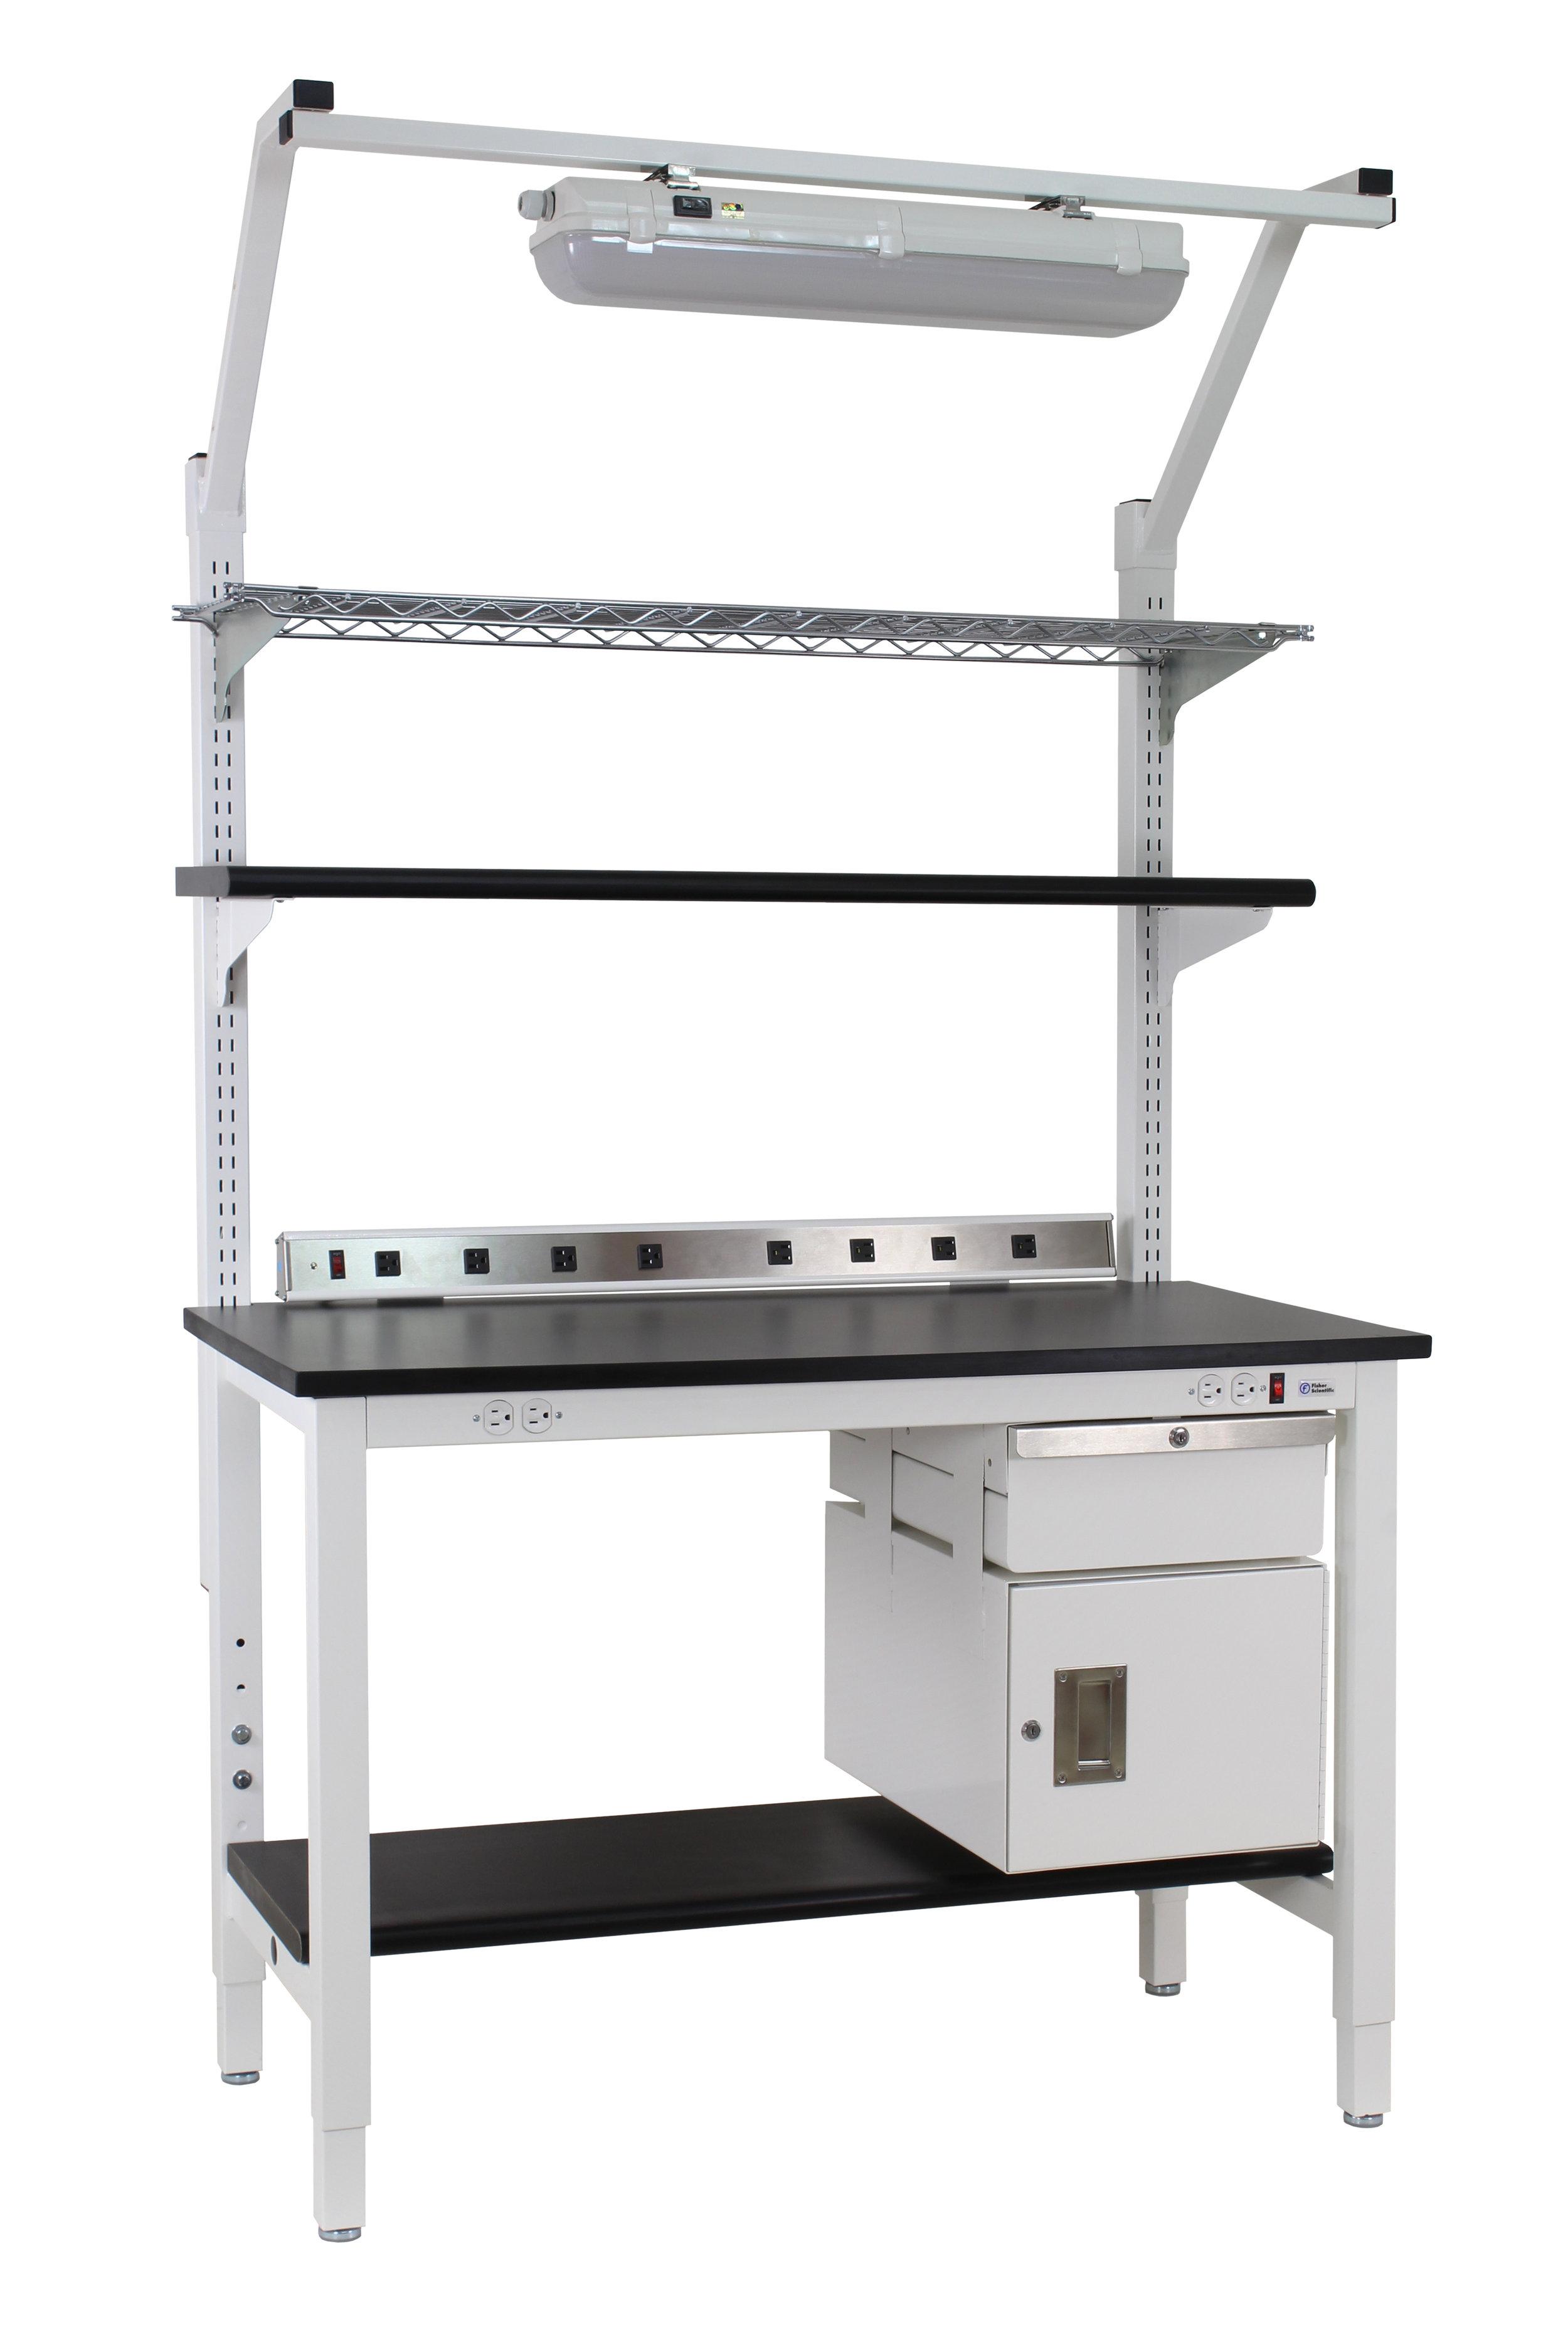 FS-KIT.jpgFlexible Laboratory Work Bench System